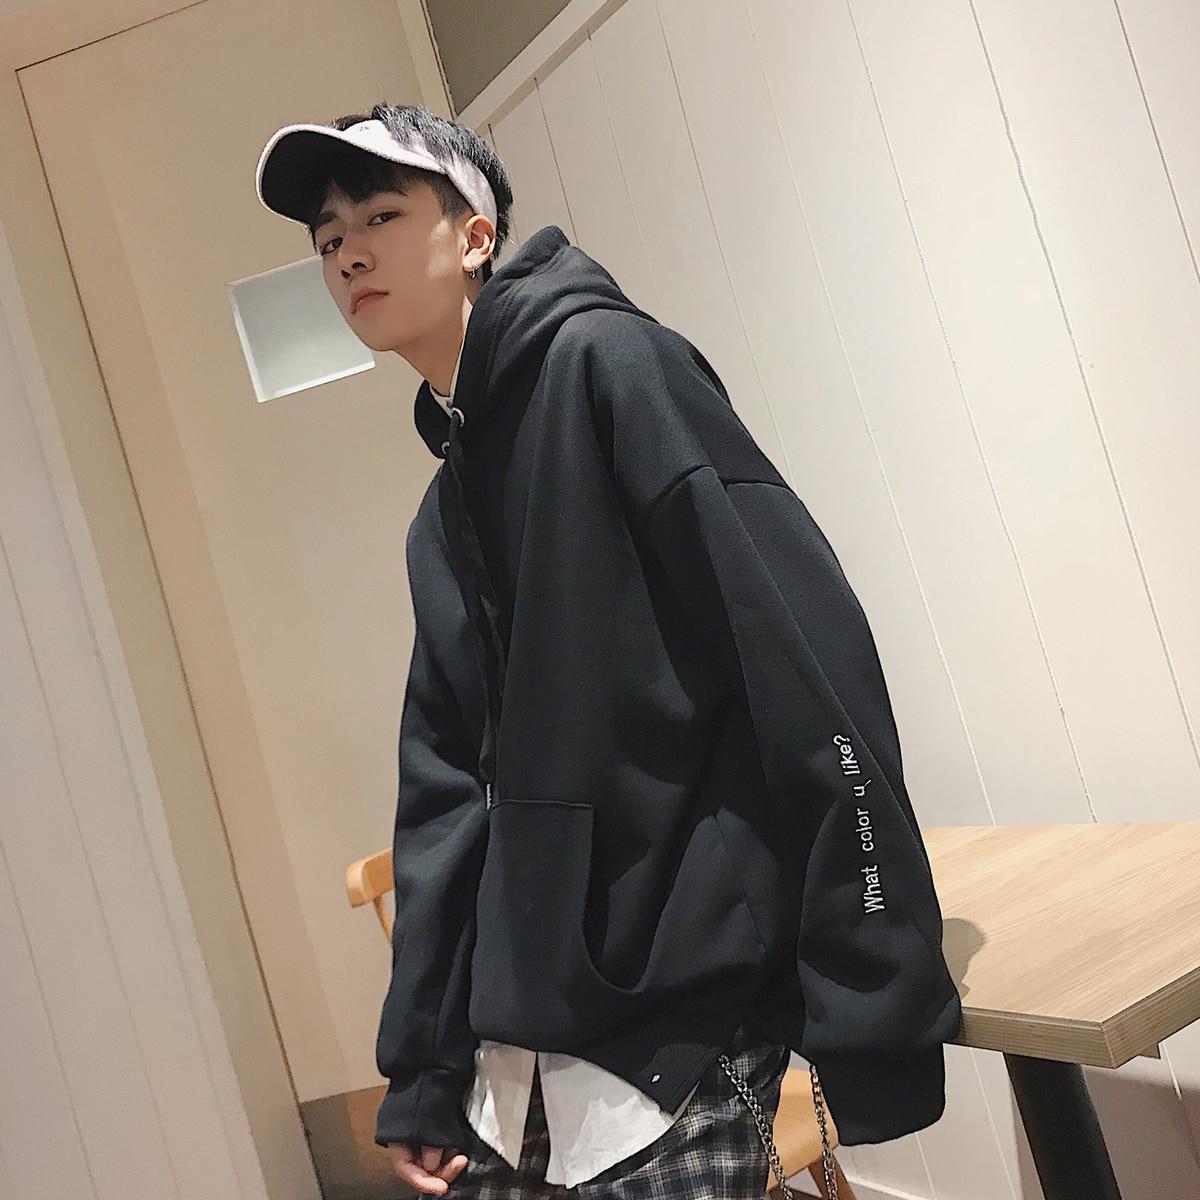 Streetwear Broderie xl Printemps Pull Shirts M Étudiant roses Chapeau Hommes gray Jeunesse 2018 Solide Kangourou Harajuku Couleur Sweat Poche yellow Black qt5txwagd